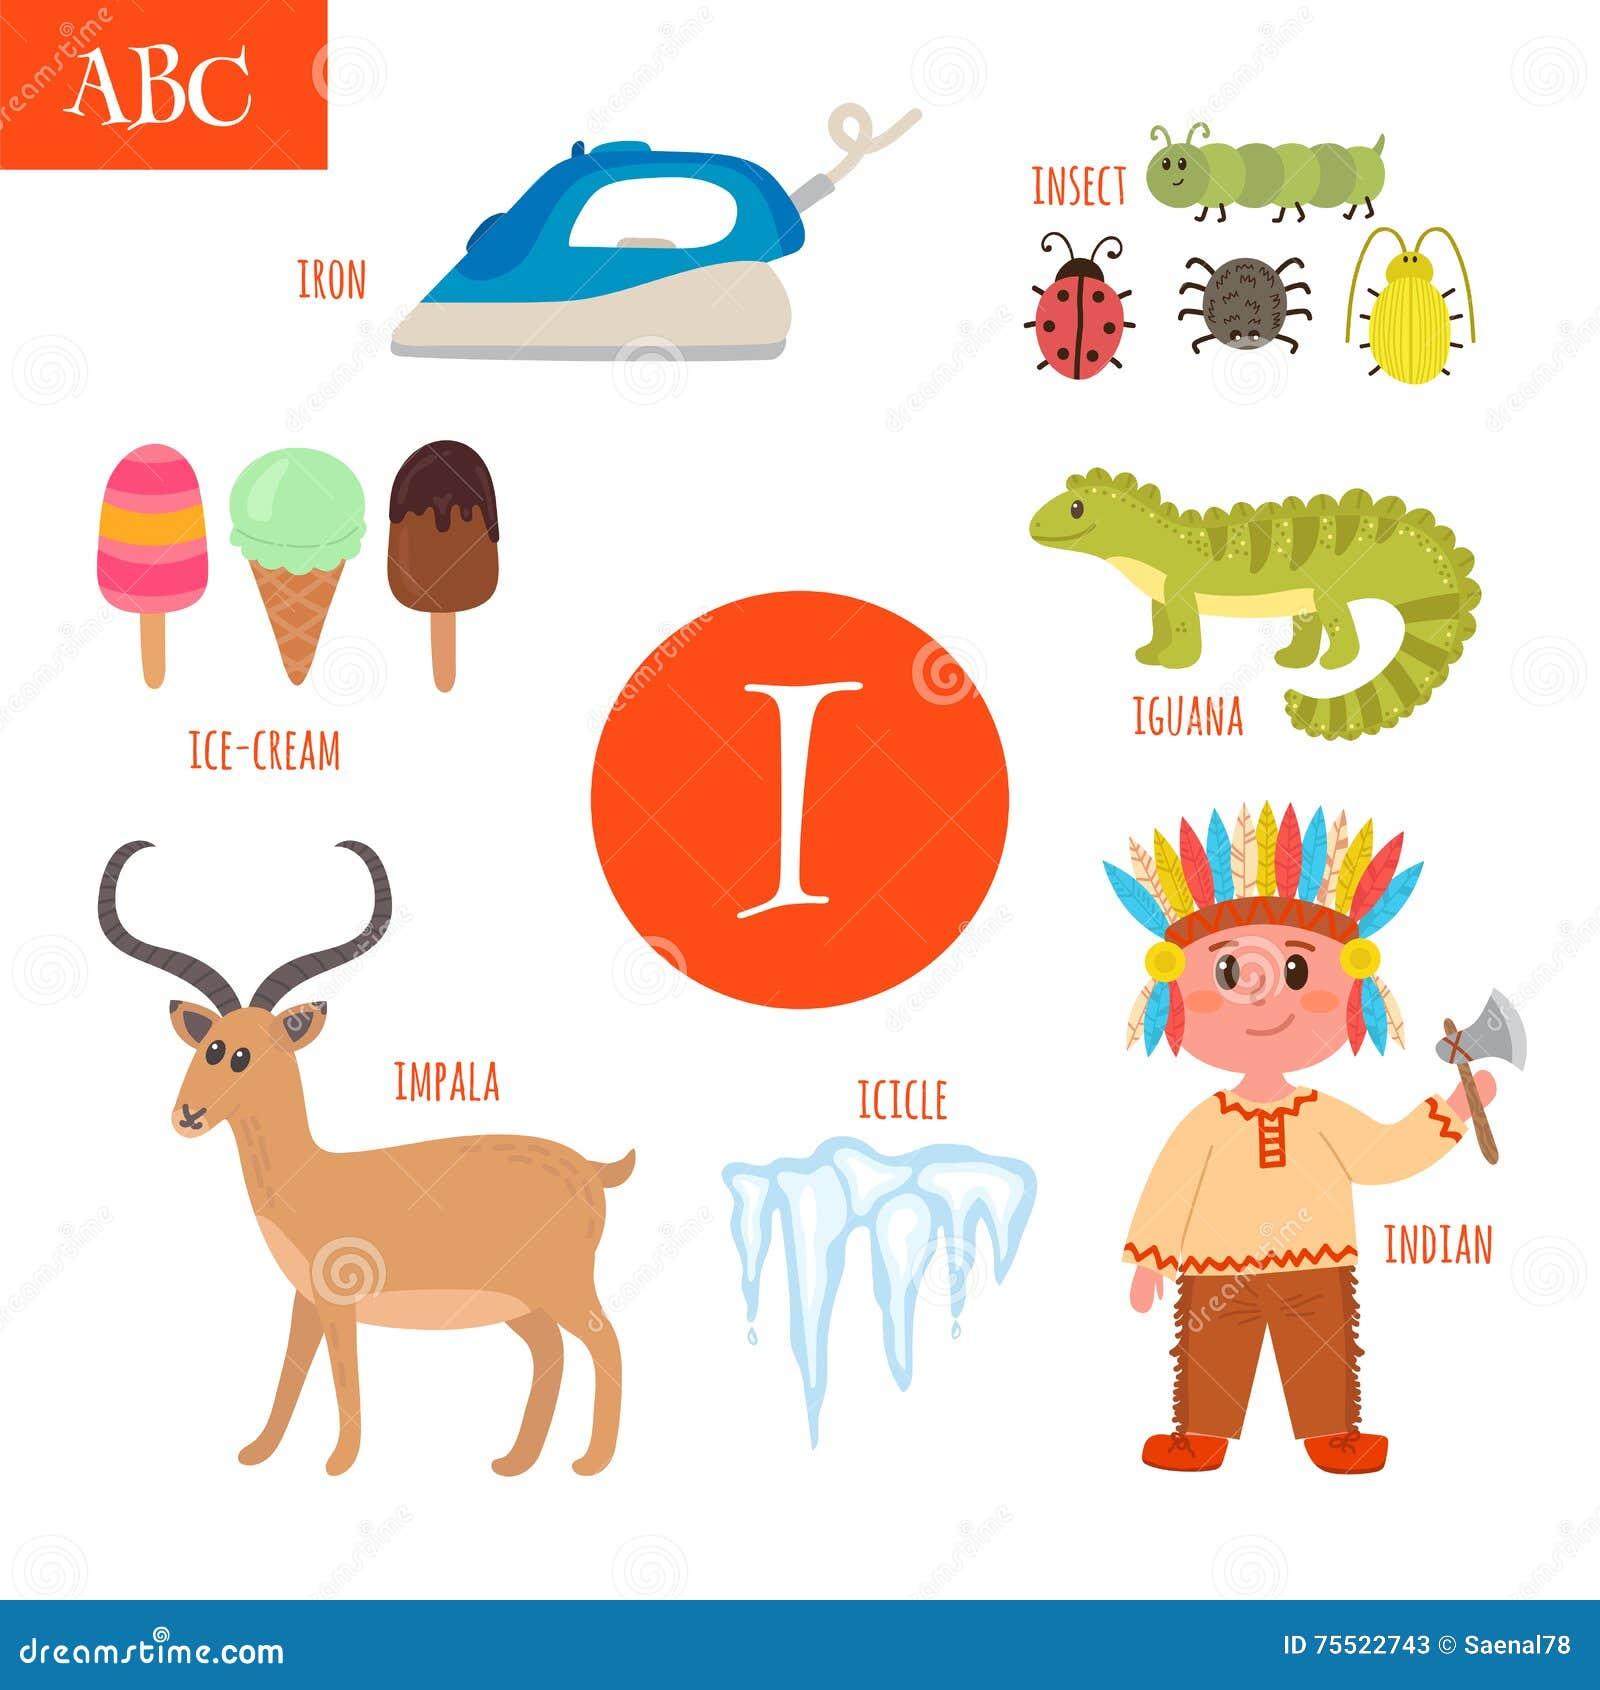 I Is For Iron ~ Letter i cartoon alphabet for children iguana ice cream